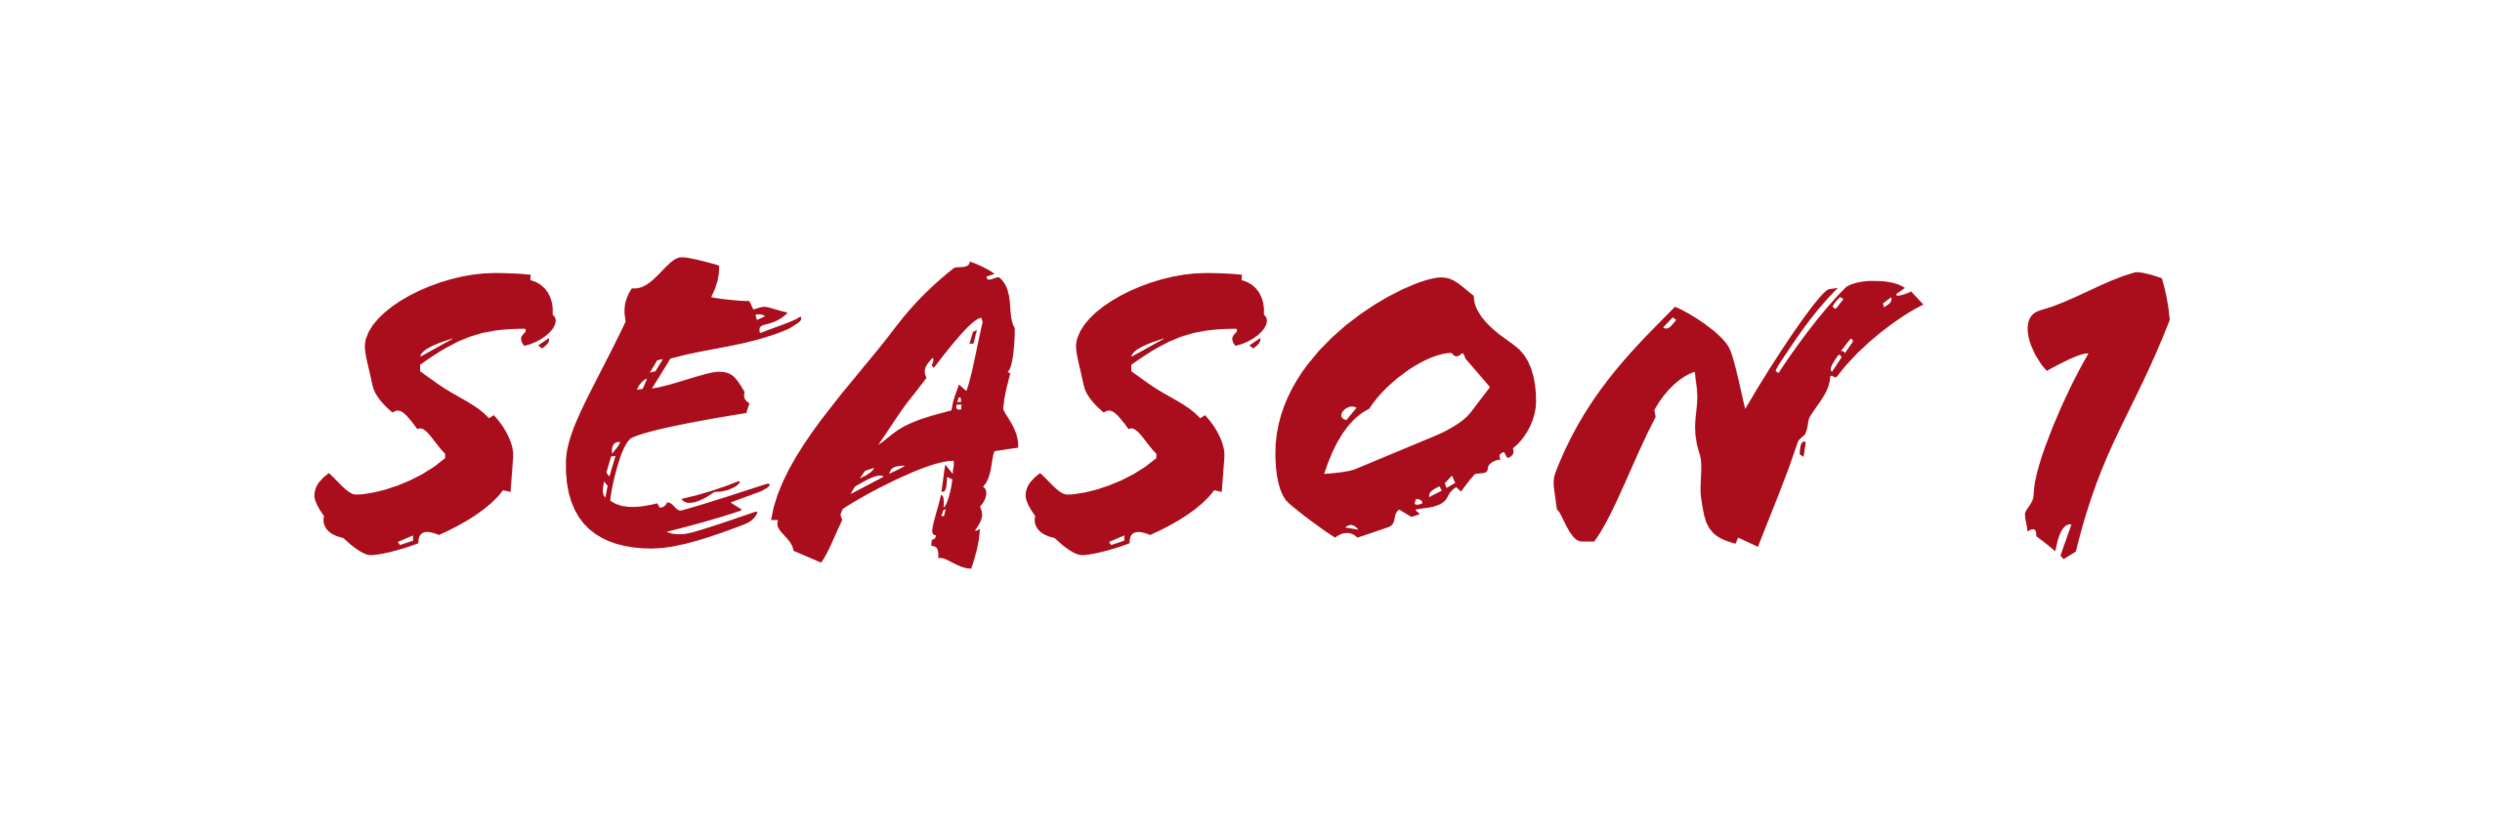 season 1 banner.png